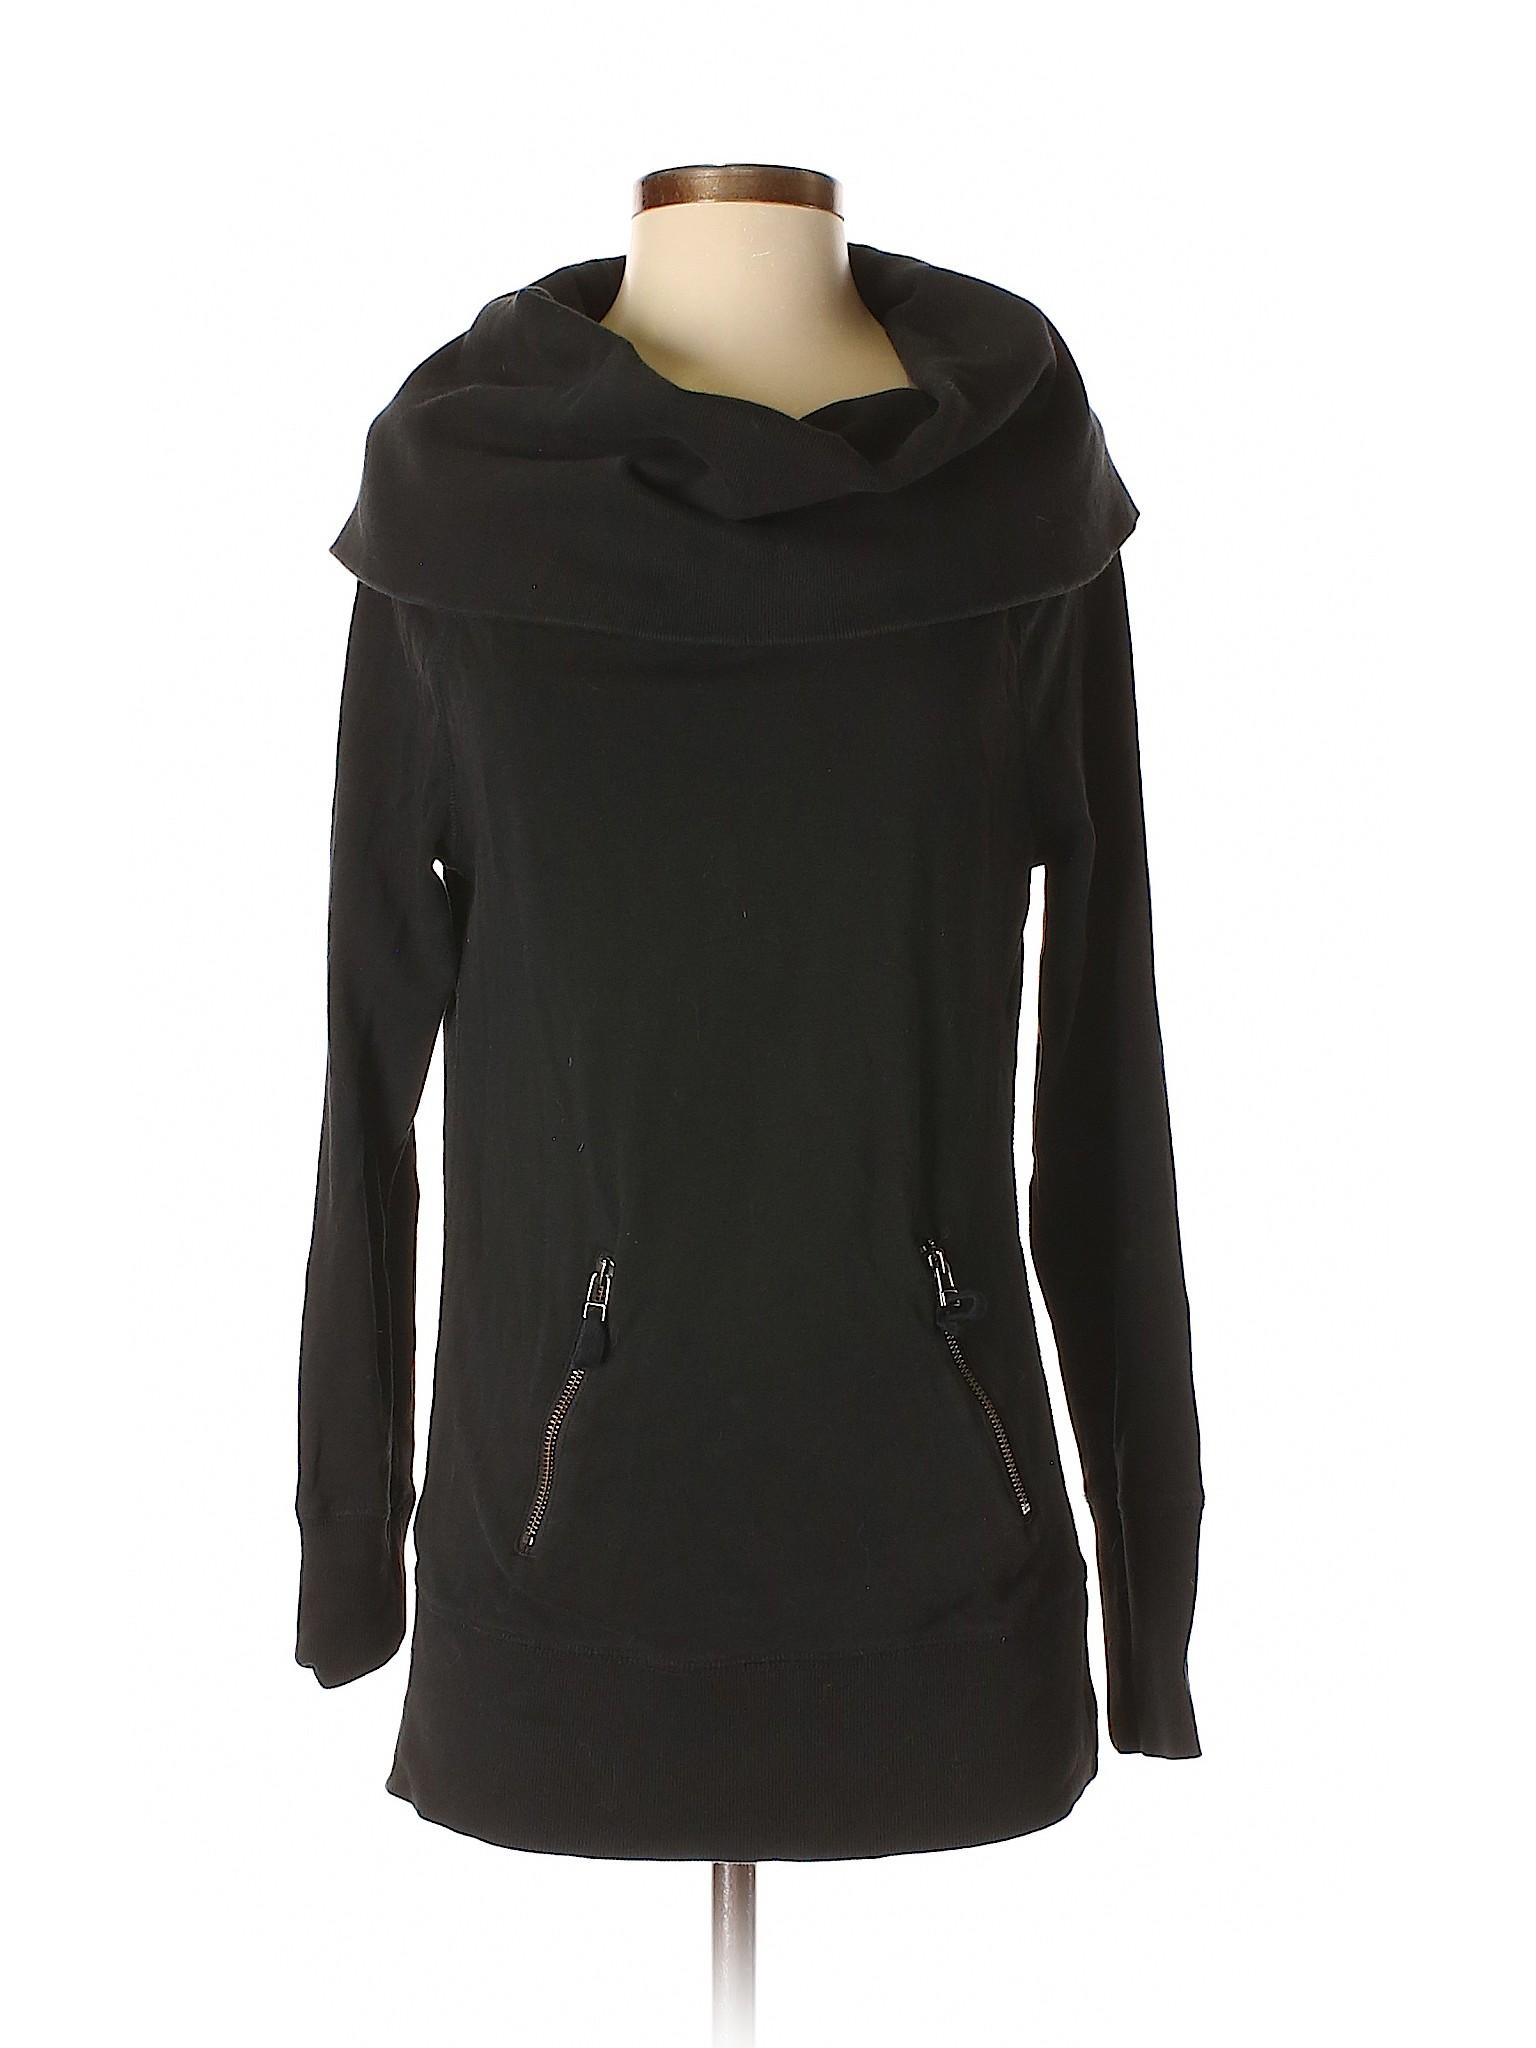 LOFT winter Taylor Boutique Sweater Ann Pullover qTtBx4Y